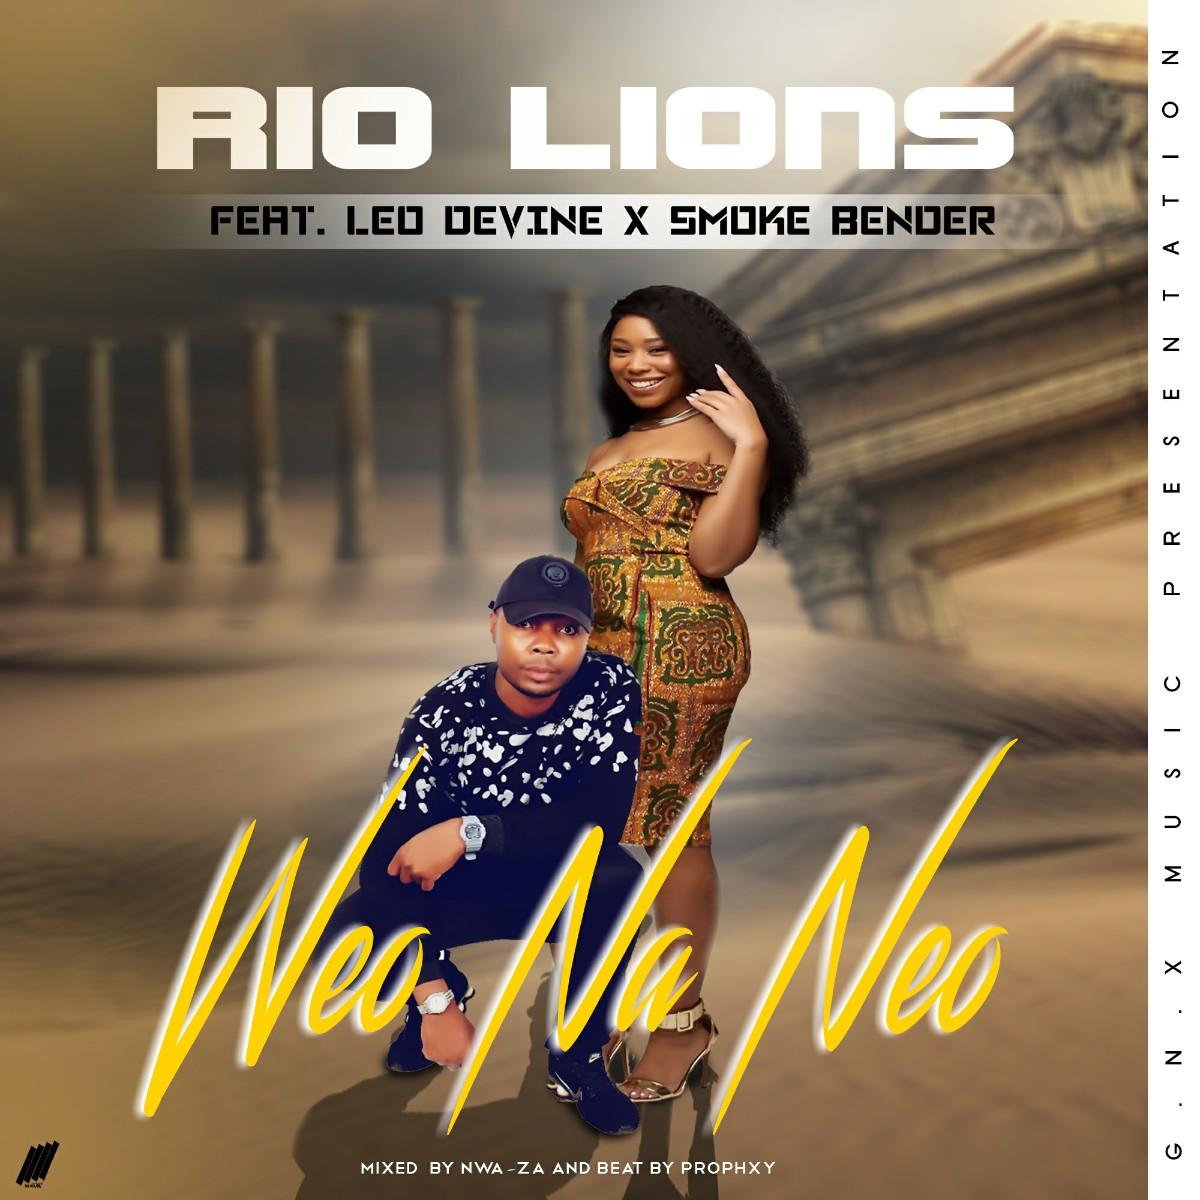 Rio Lions ft. Leo Devine & Smoke Bender - Weo Na Neo